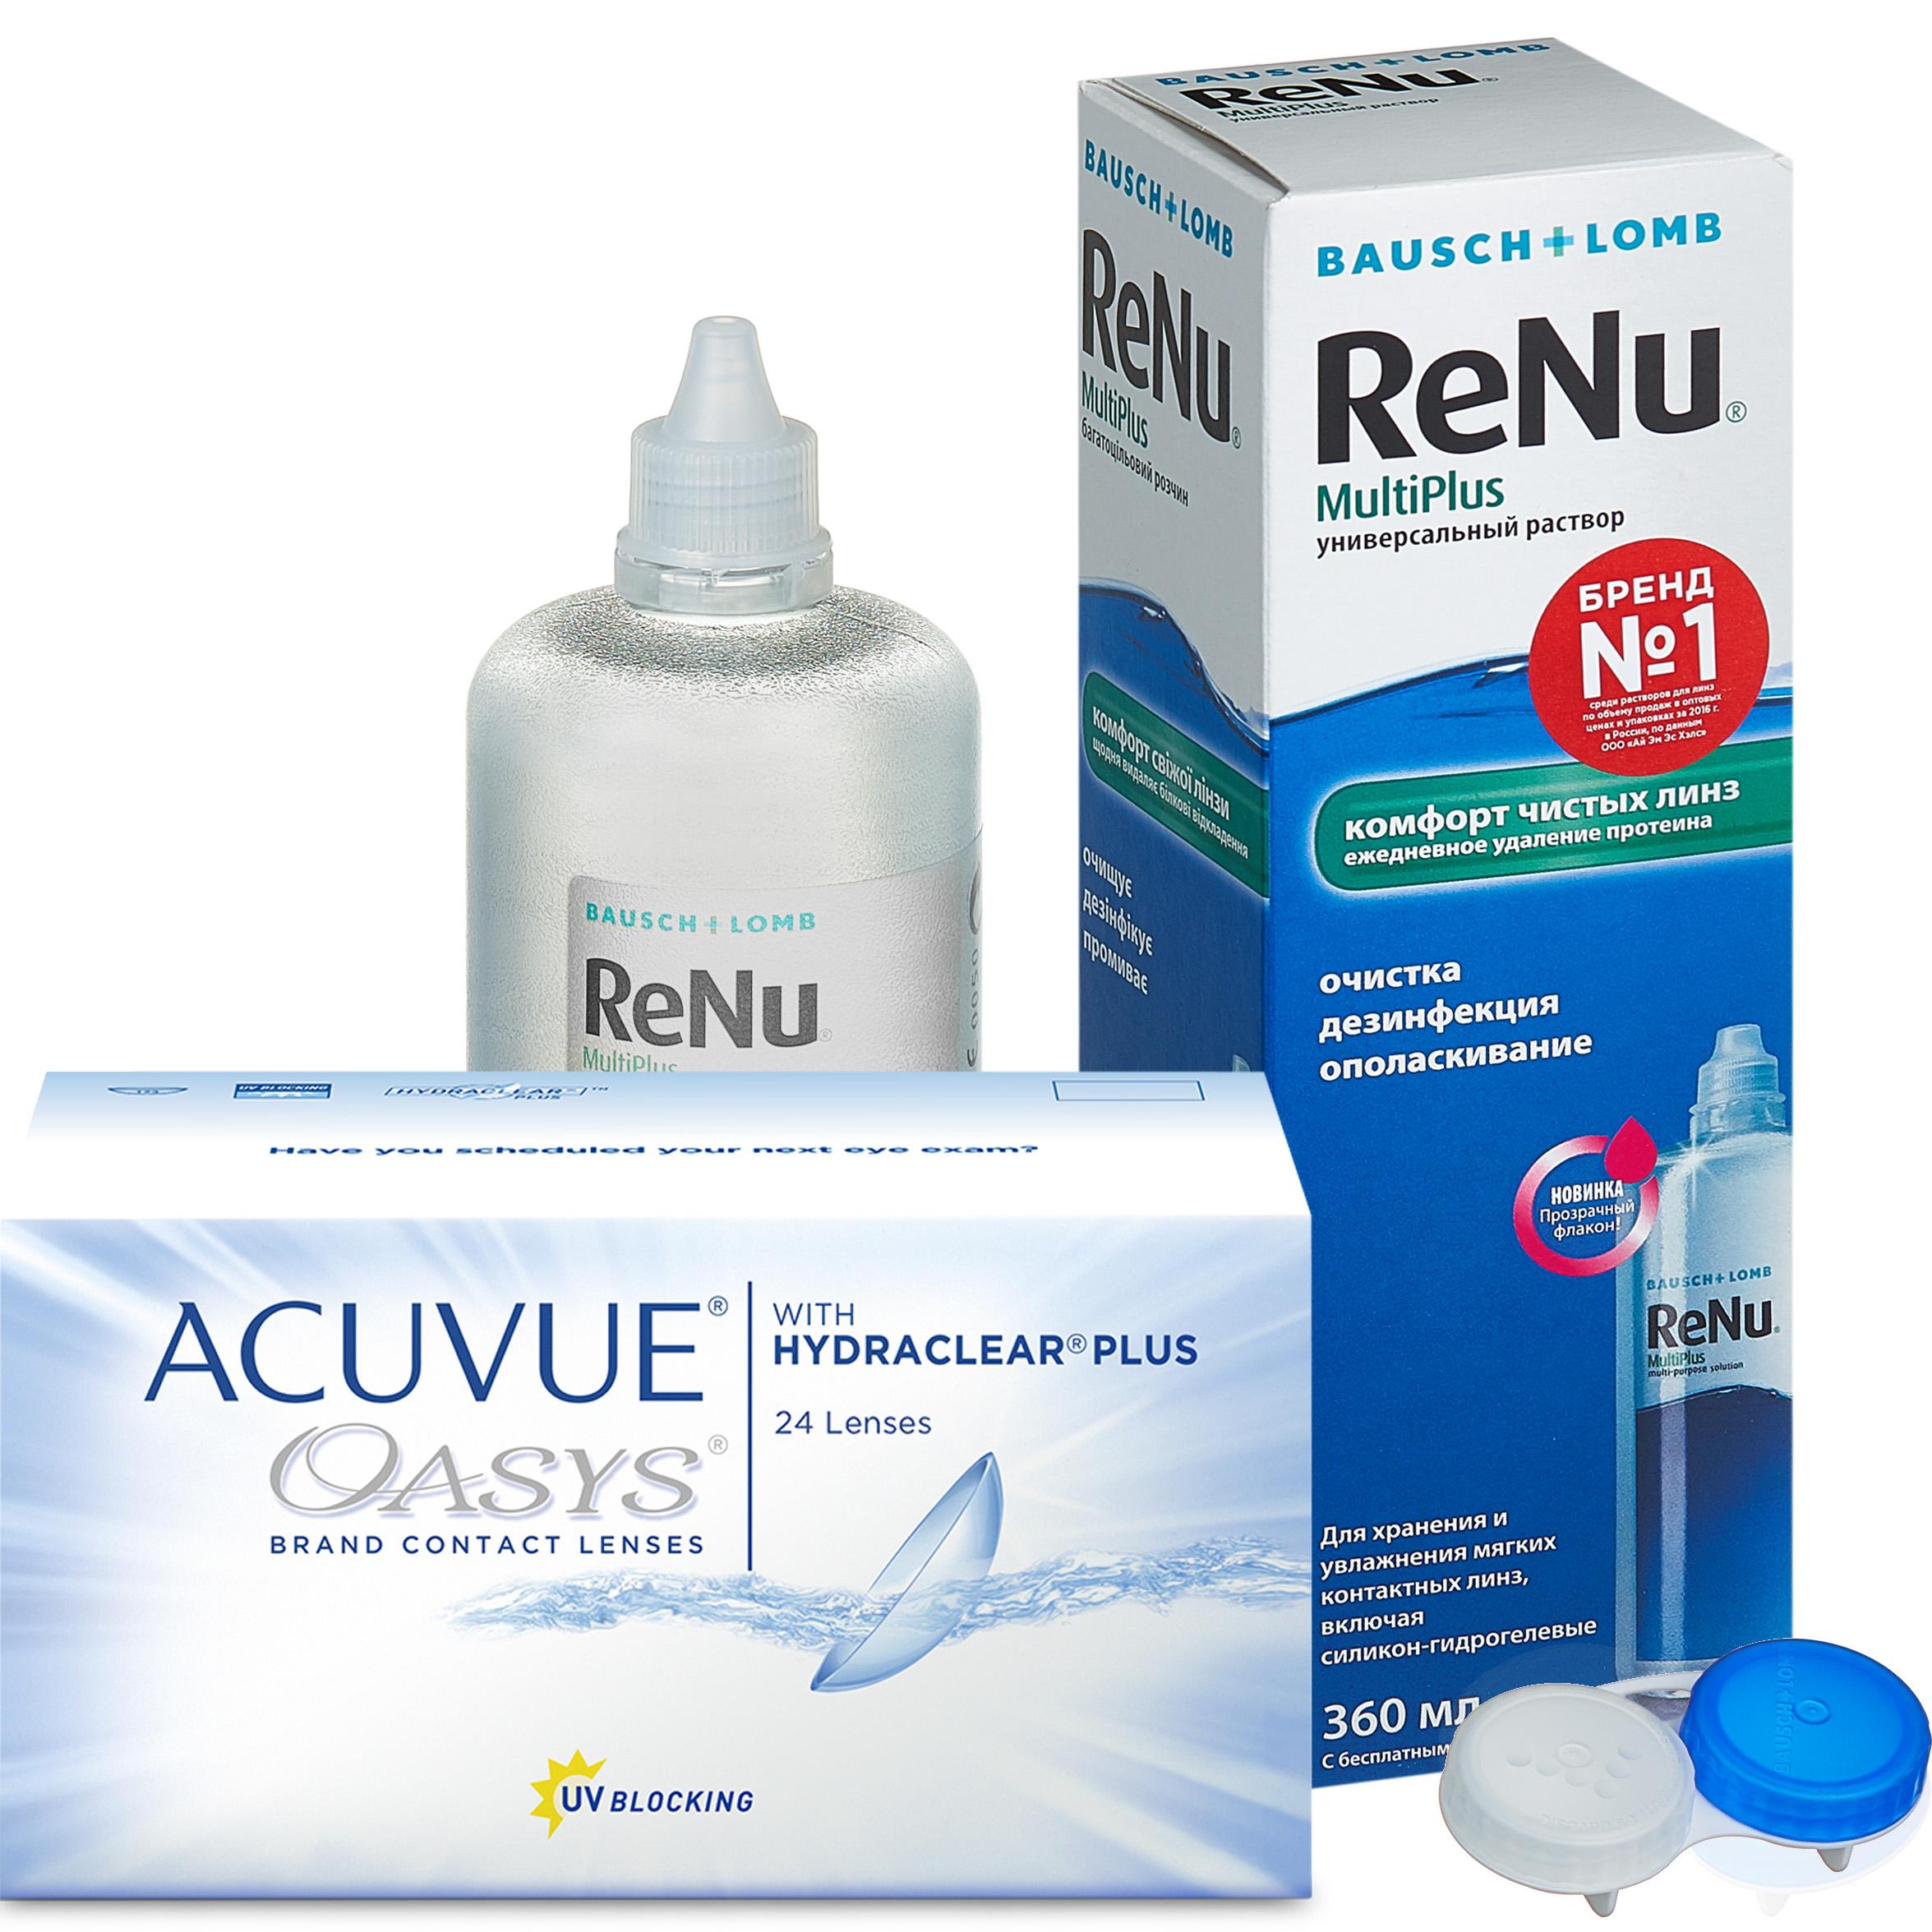 Купить Oasys with Hydraclear Plus 24 линзы + ReNu MultiPlus, Линзы Acuvue Oasys with Hydraclear Plus 24 линзы R 8.8 -11, 50 + ReNu Multi Plus 360 мл